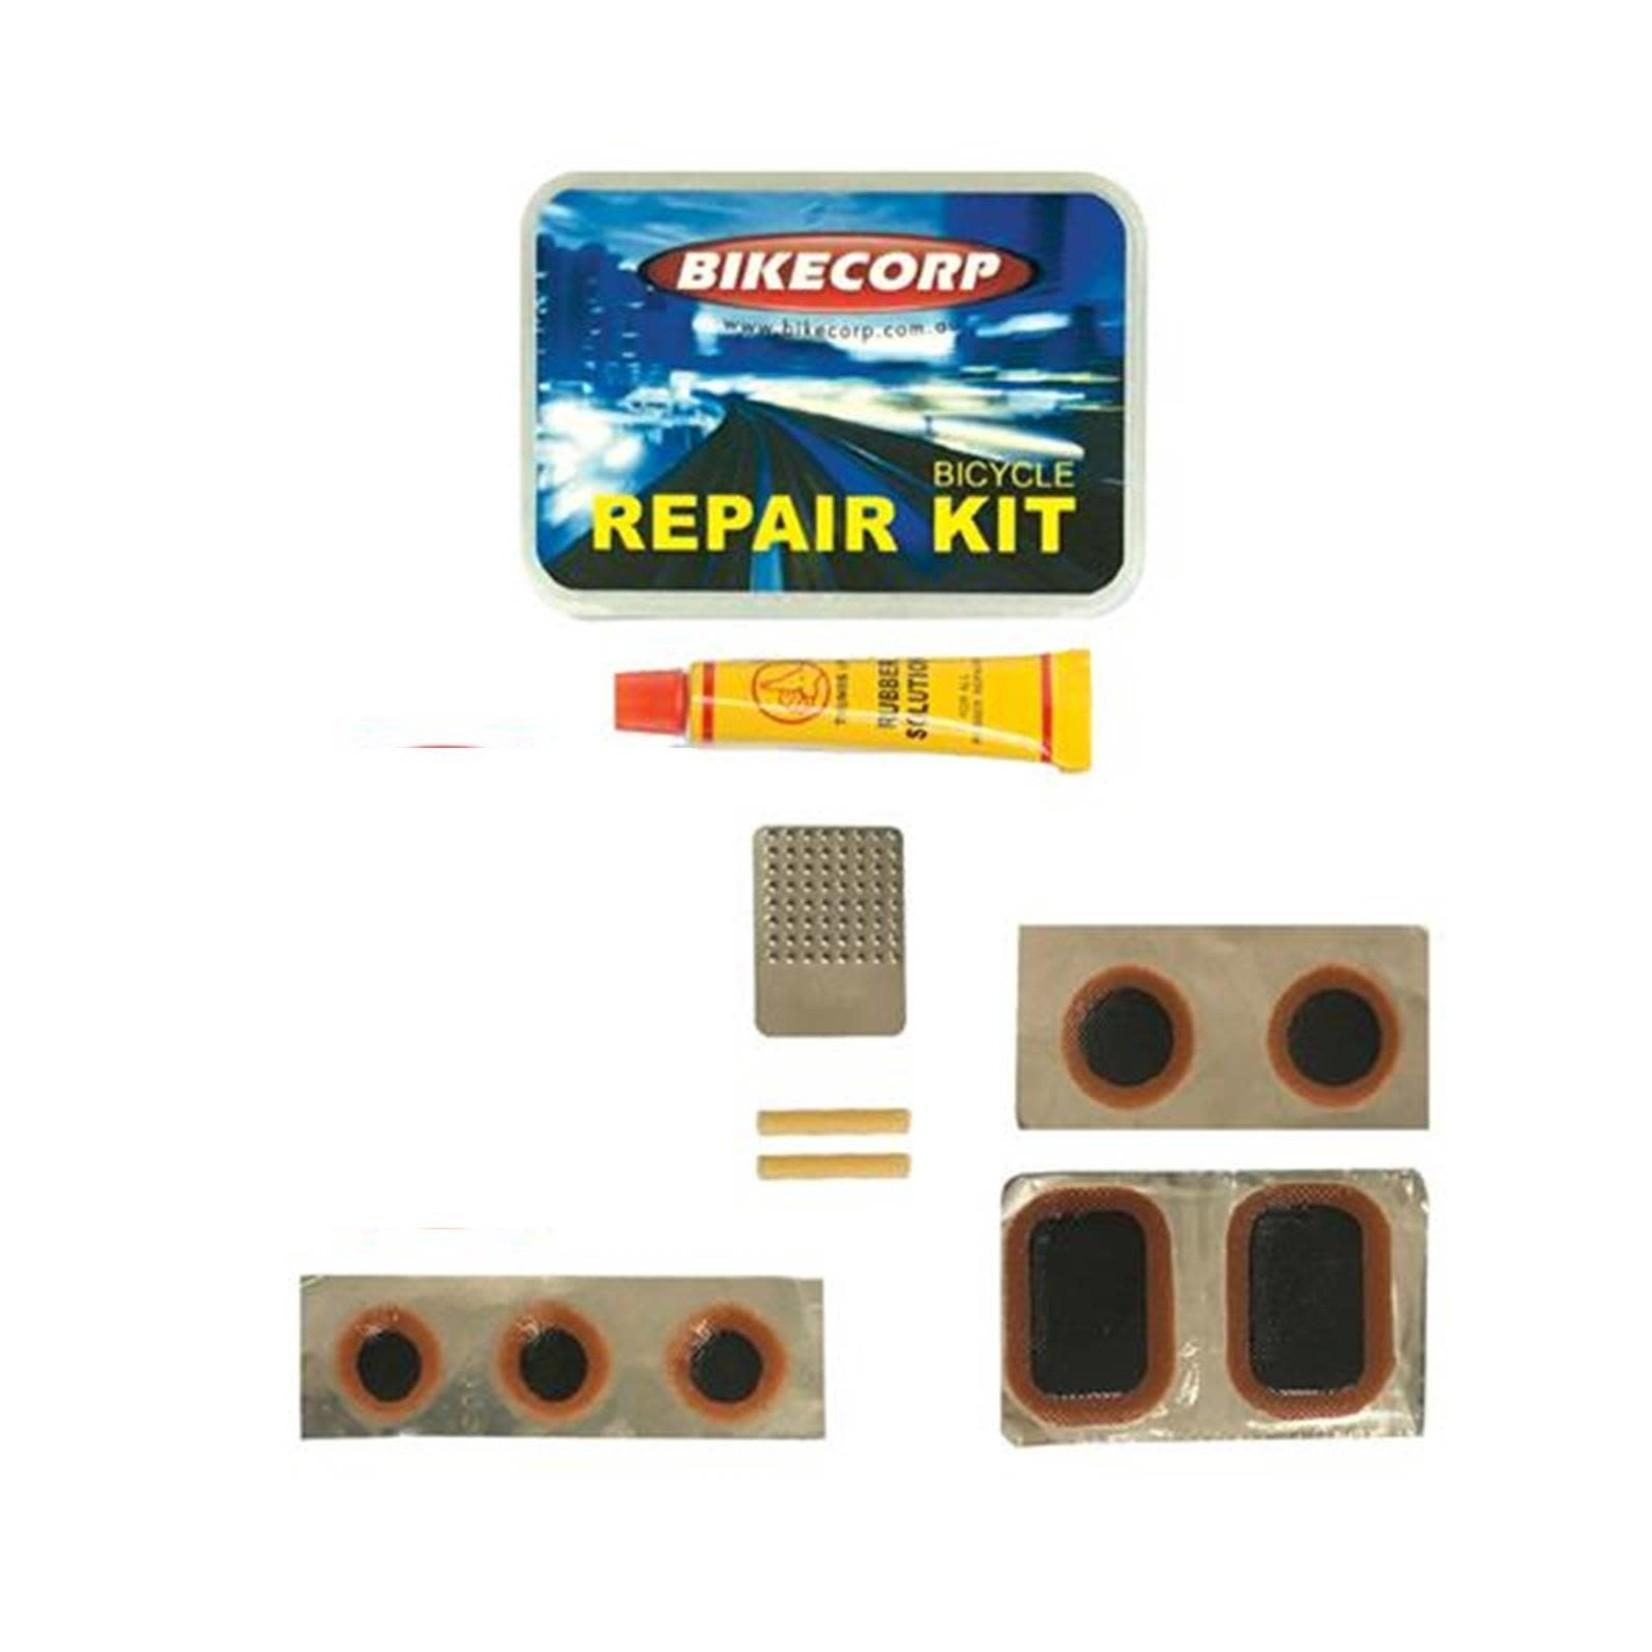 Bikecorp Puncture Repair Kit